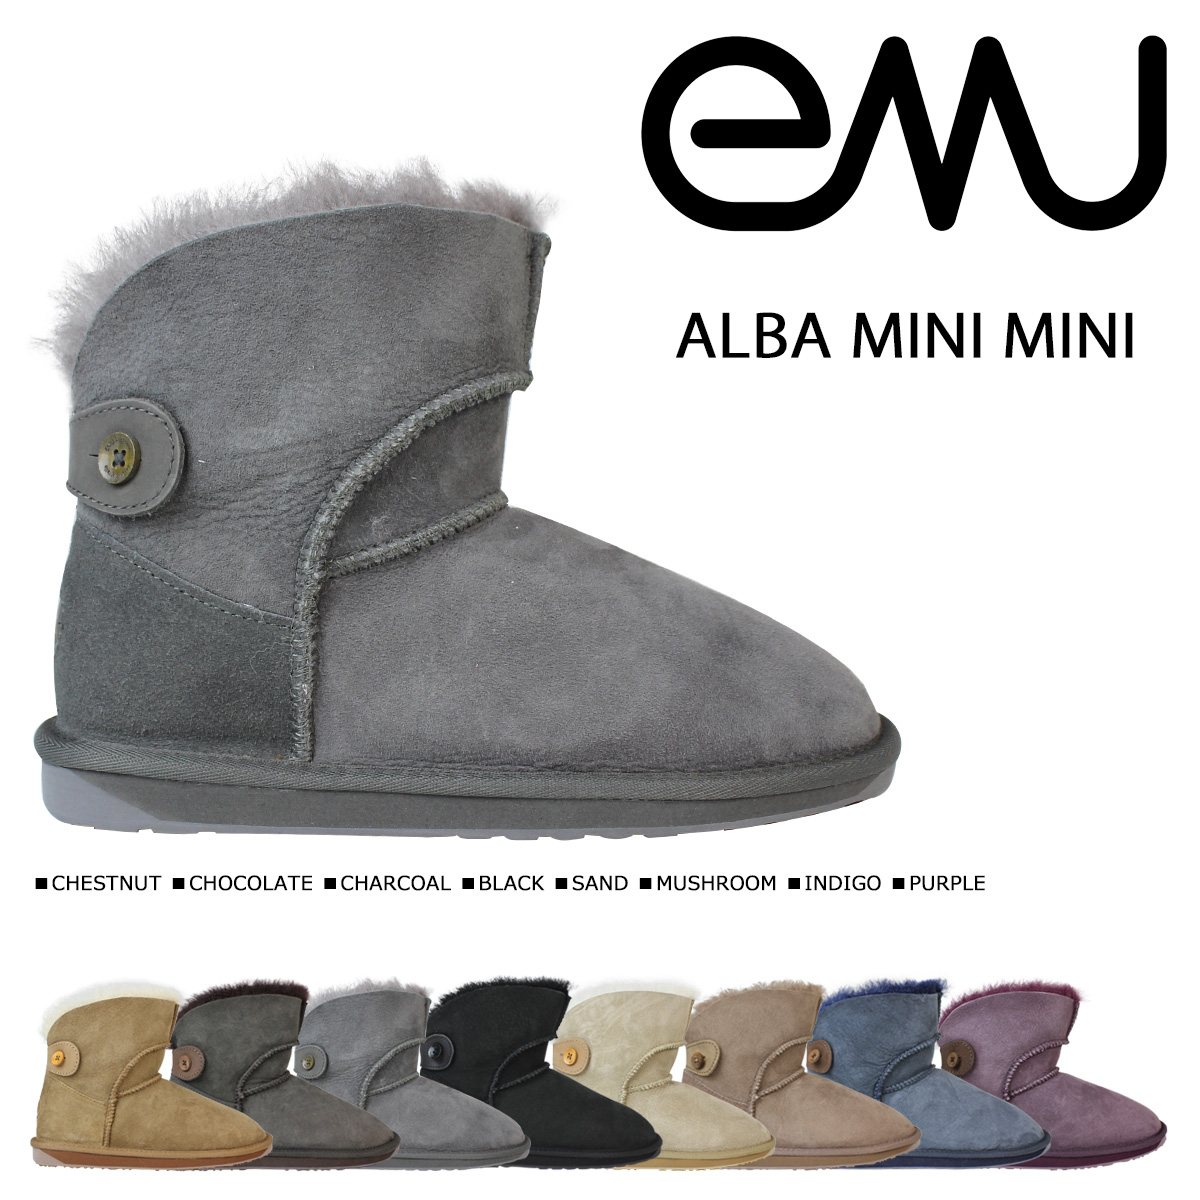 9d3cbcf123a ALLSPORTS: EMU EMU women's Alba mini mini boots ALBA MINI MINI ...